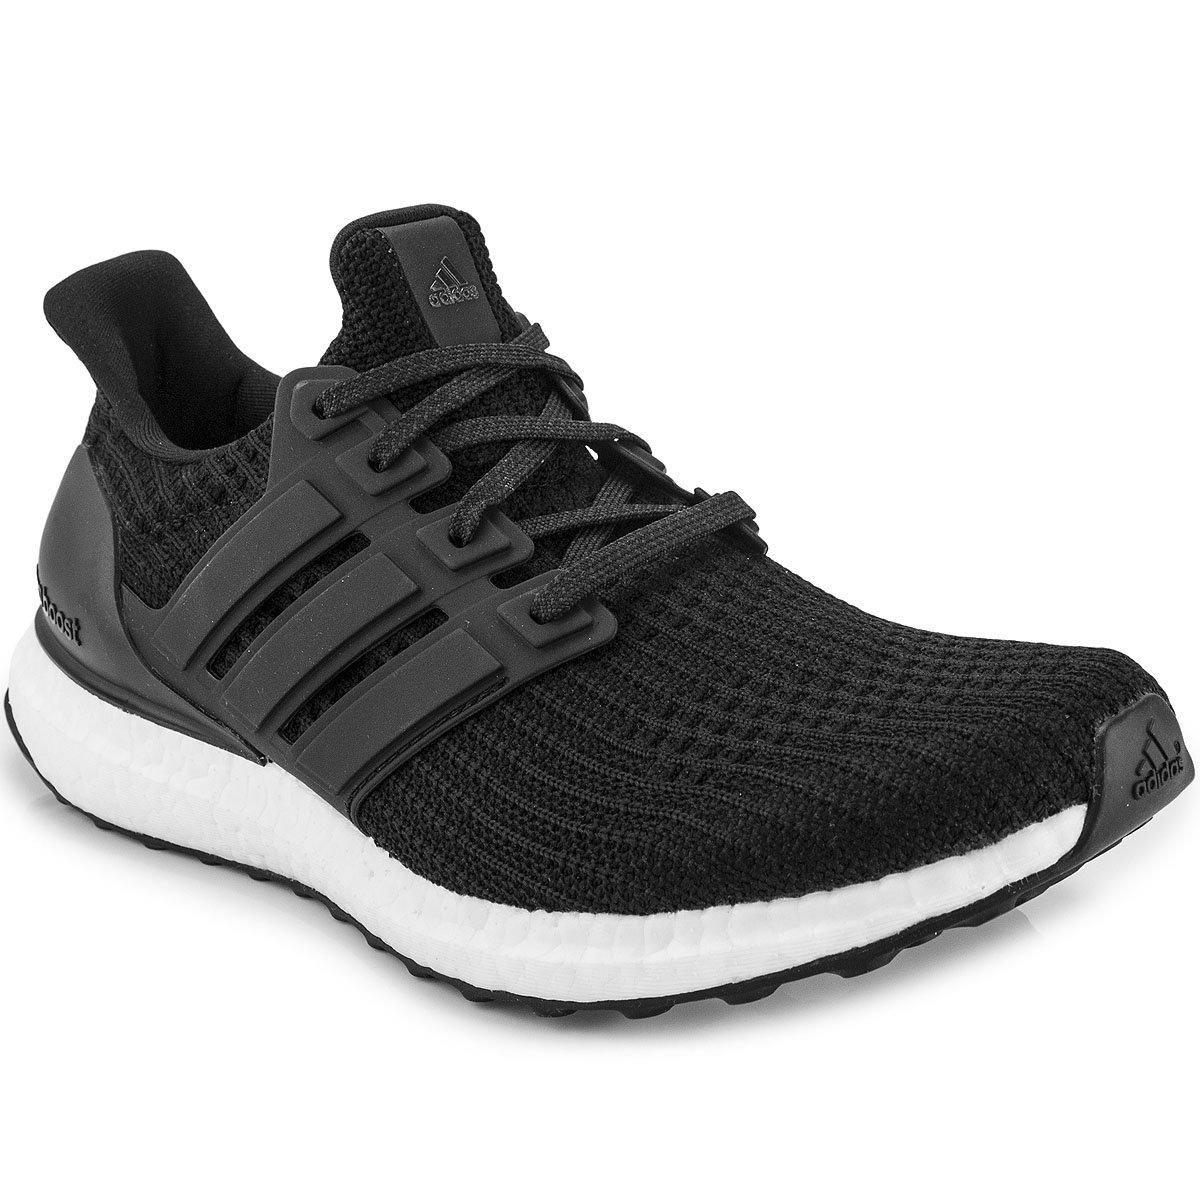 55353eb3b Tênis Adidas Ultra Boost